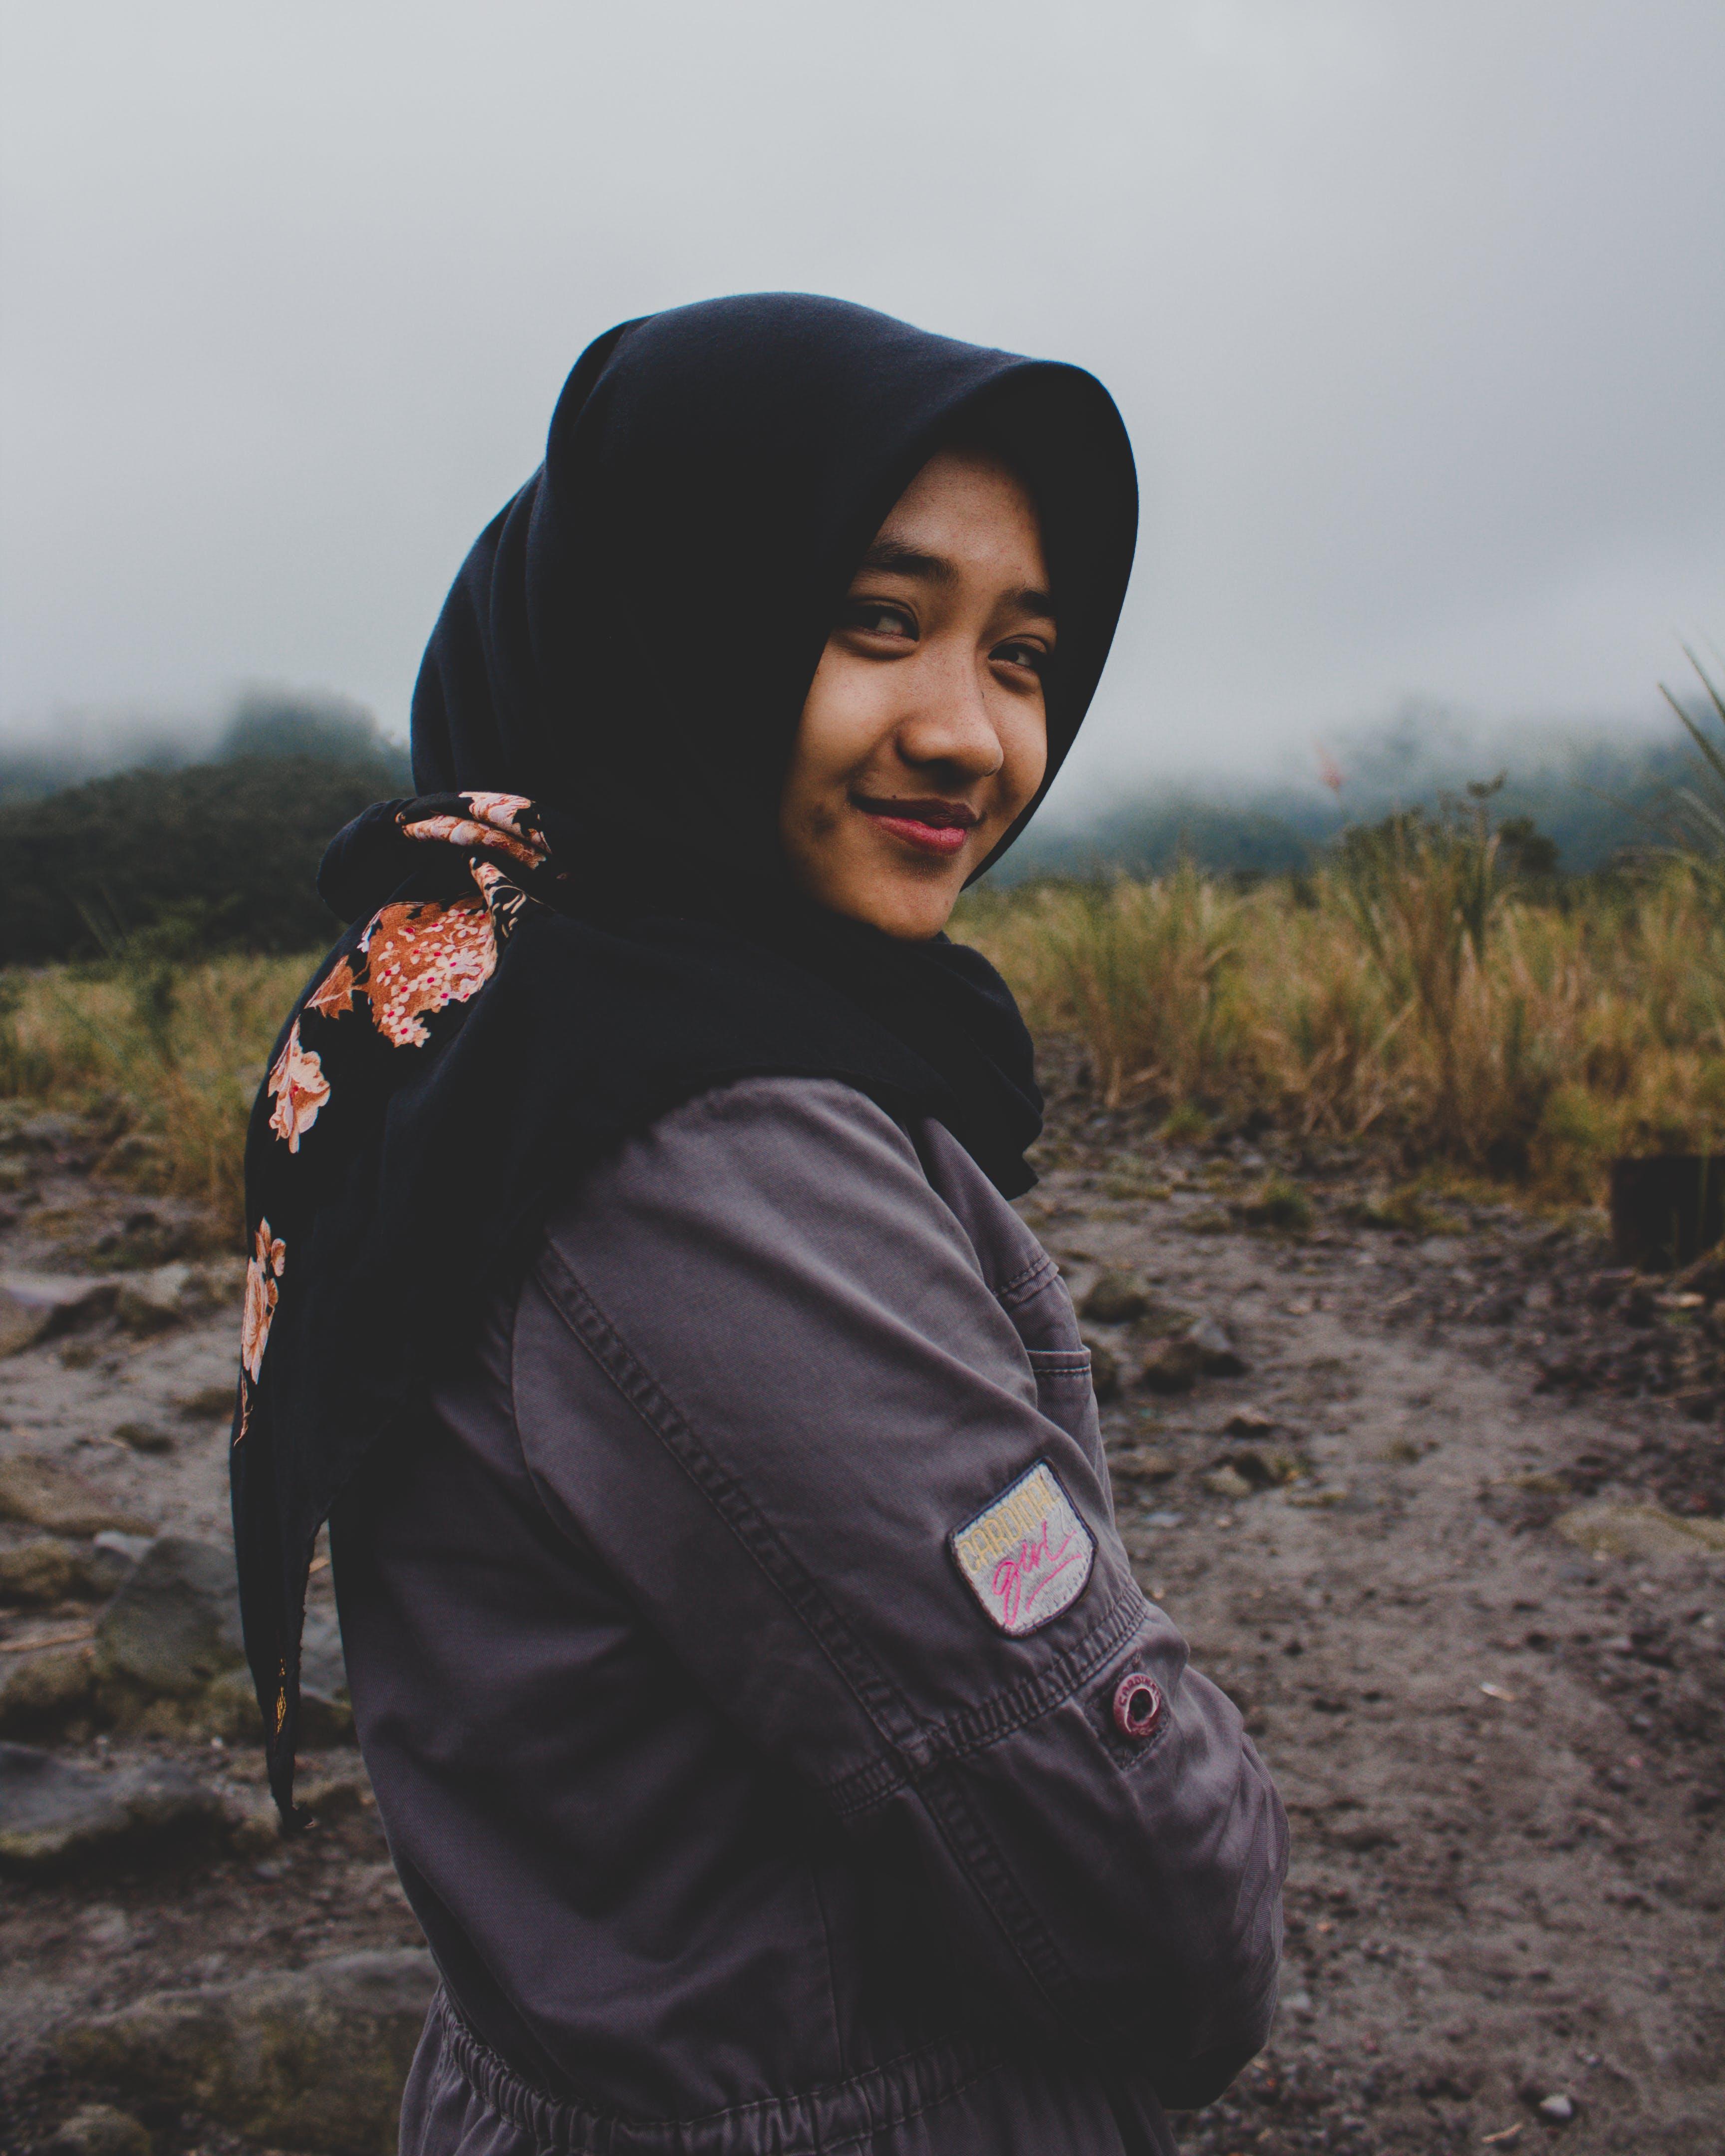 Kostenloses Stock Foto zu berg, frau, hijab, natur